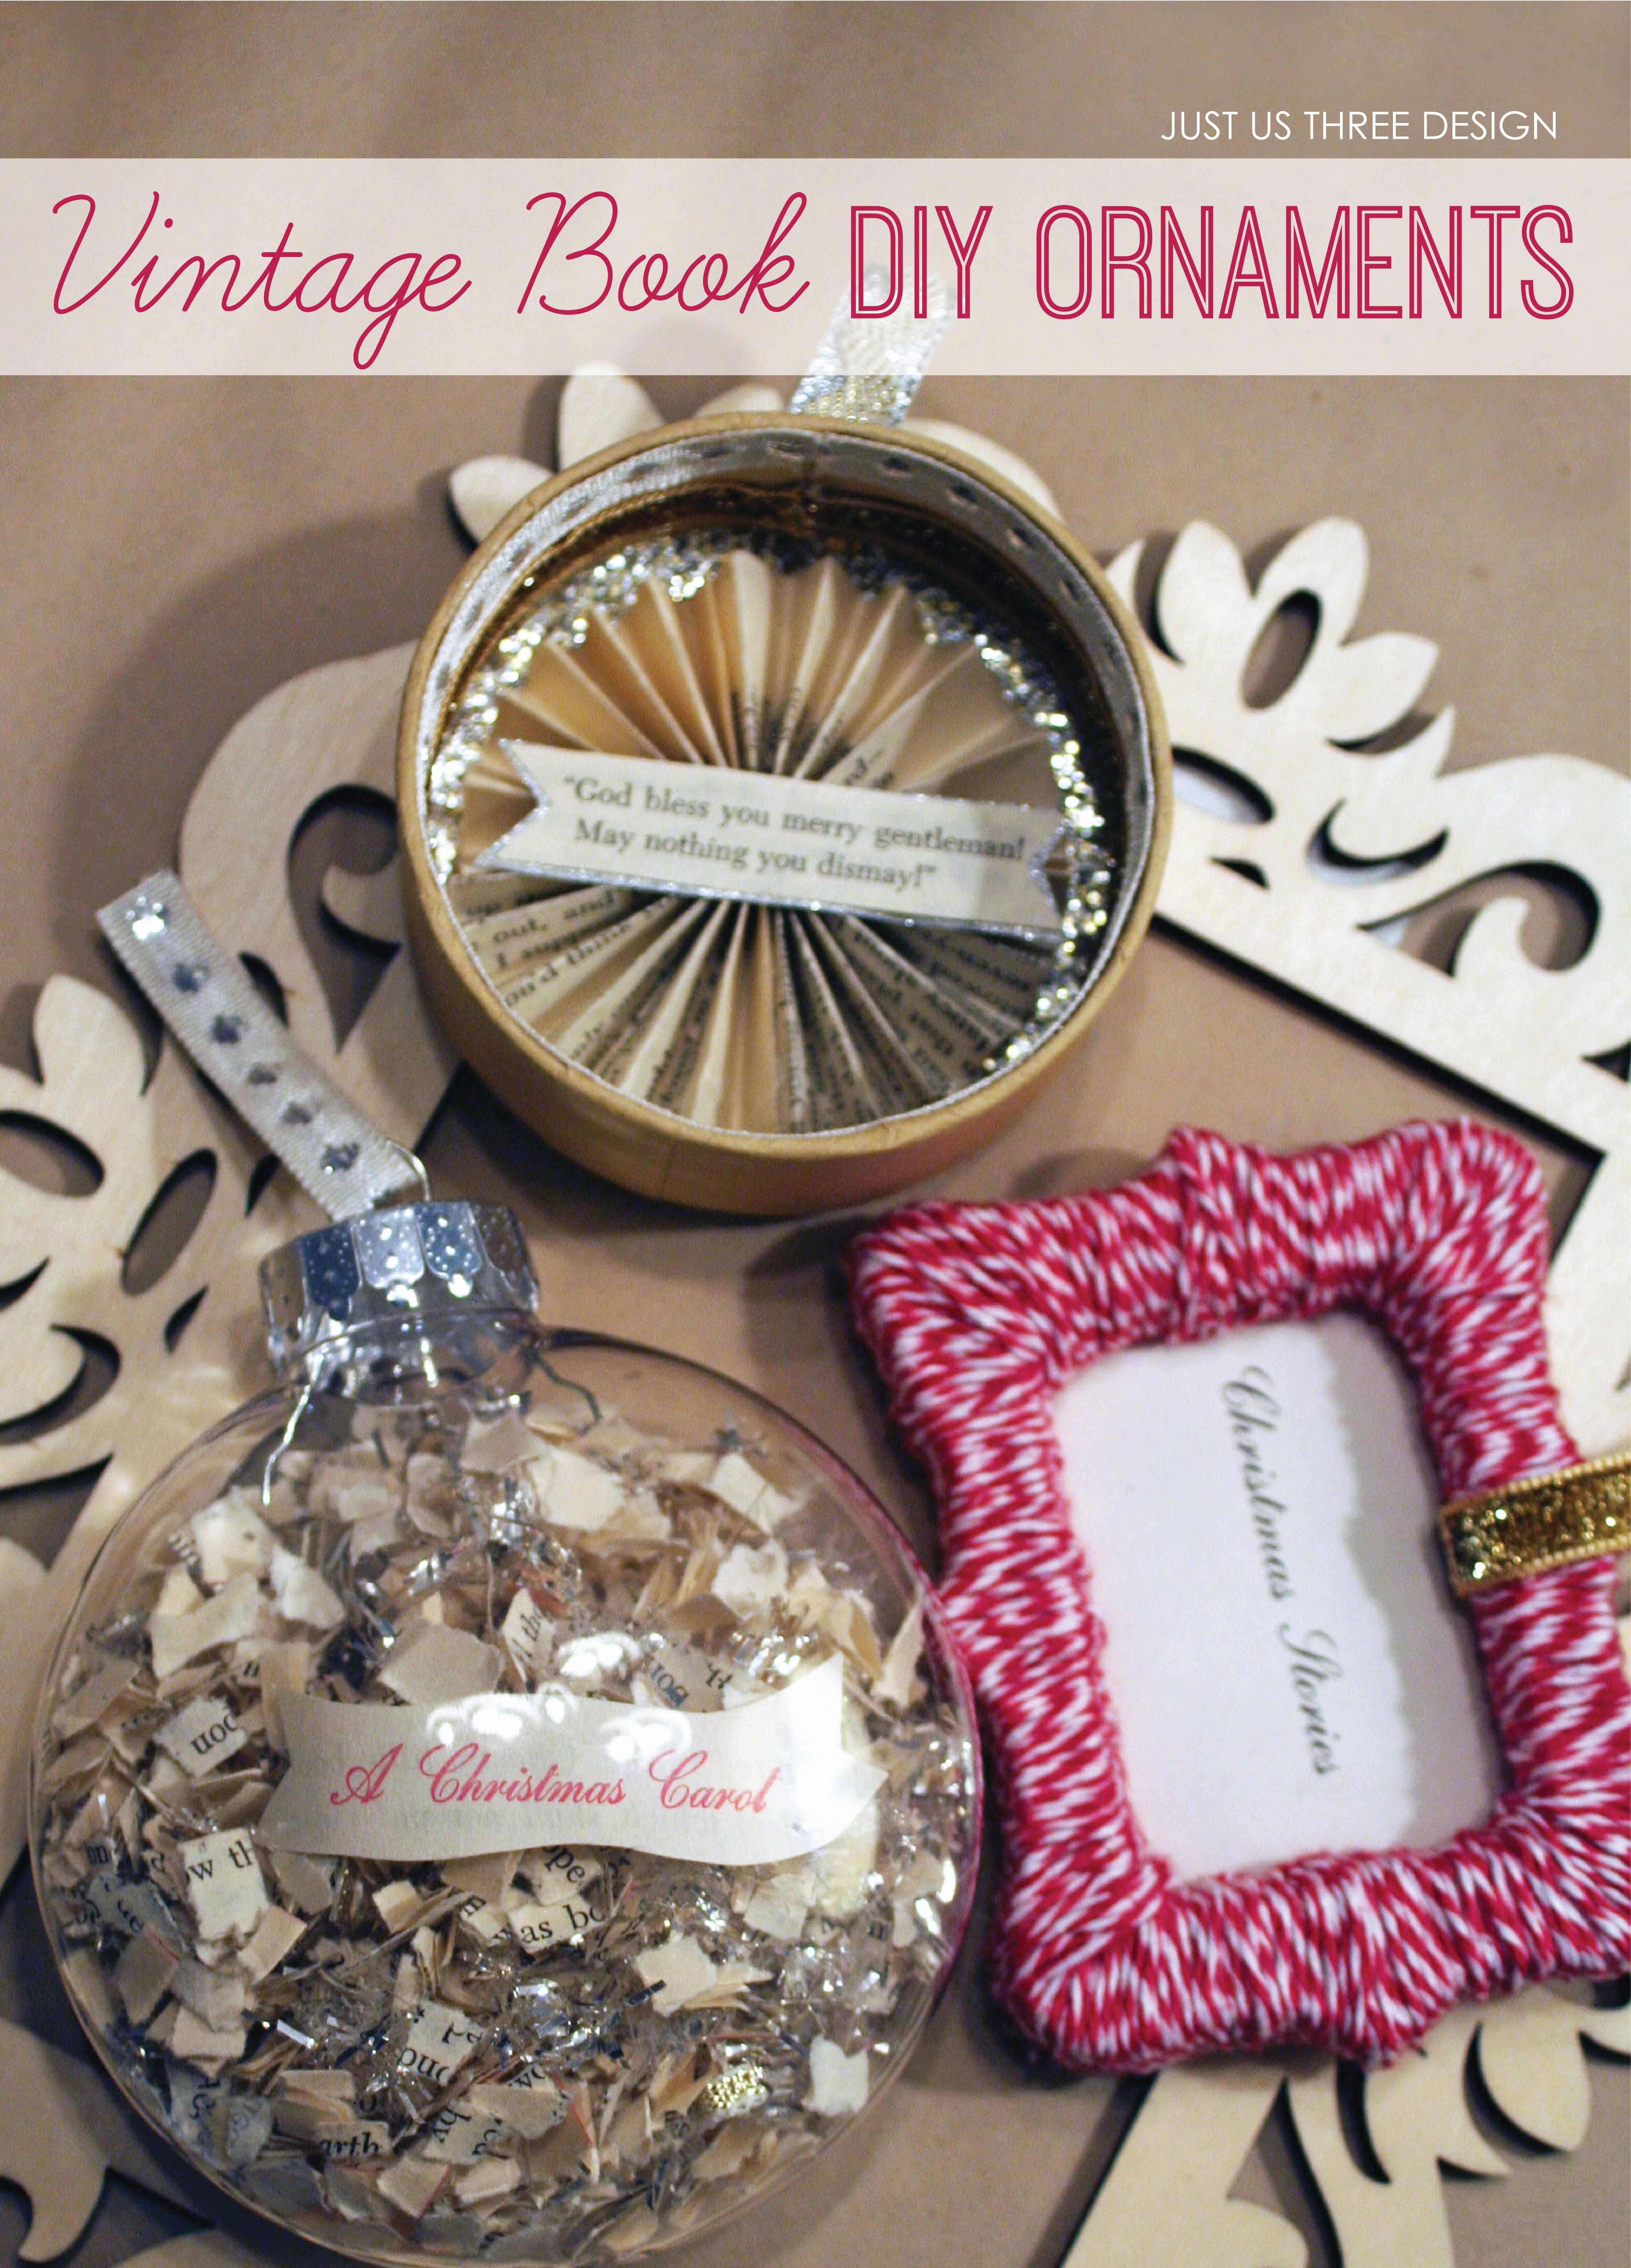 Diy retro christmas decorations - Just Us Three For Ano Diy Vintage Book Ornaments